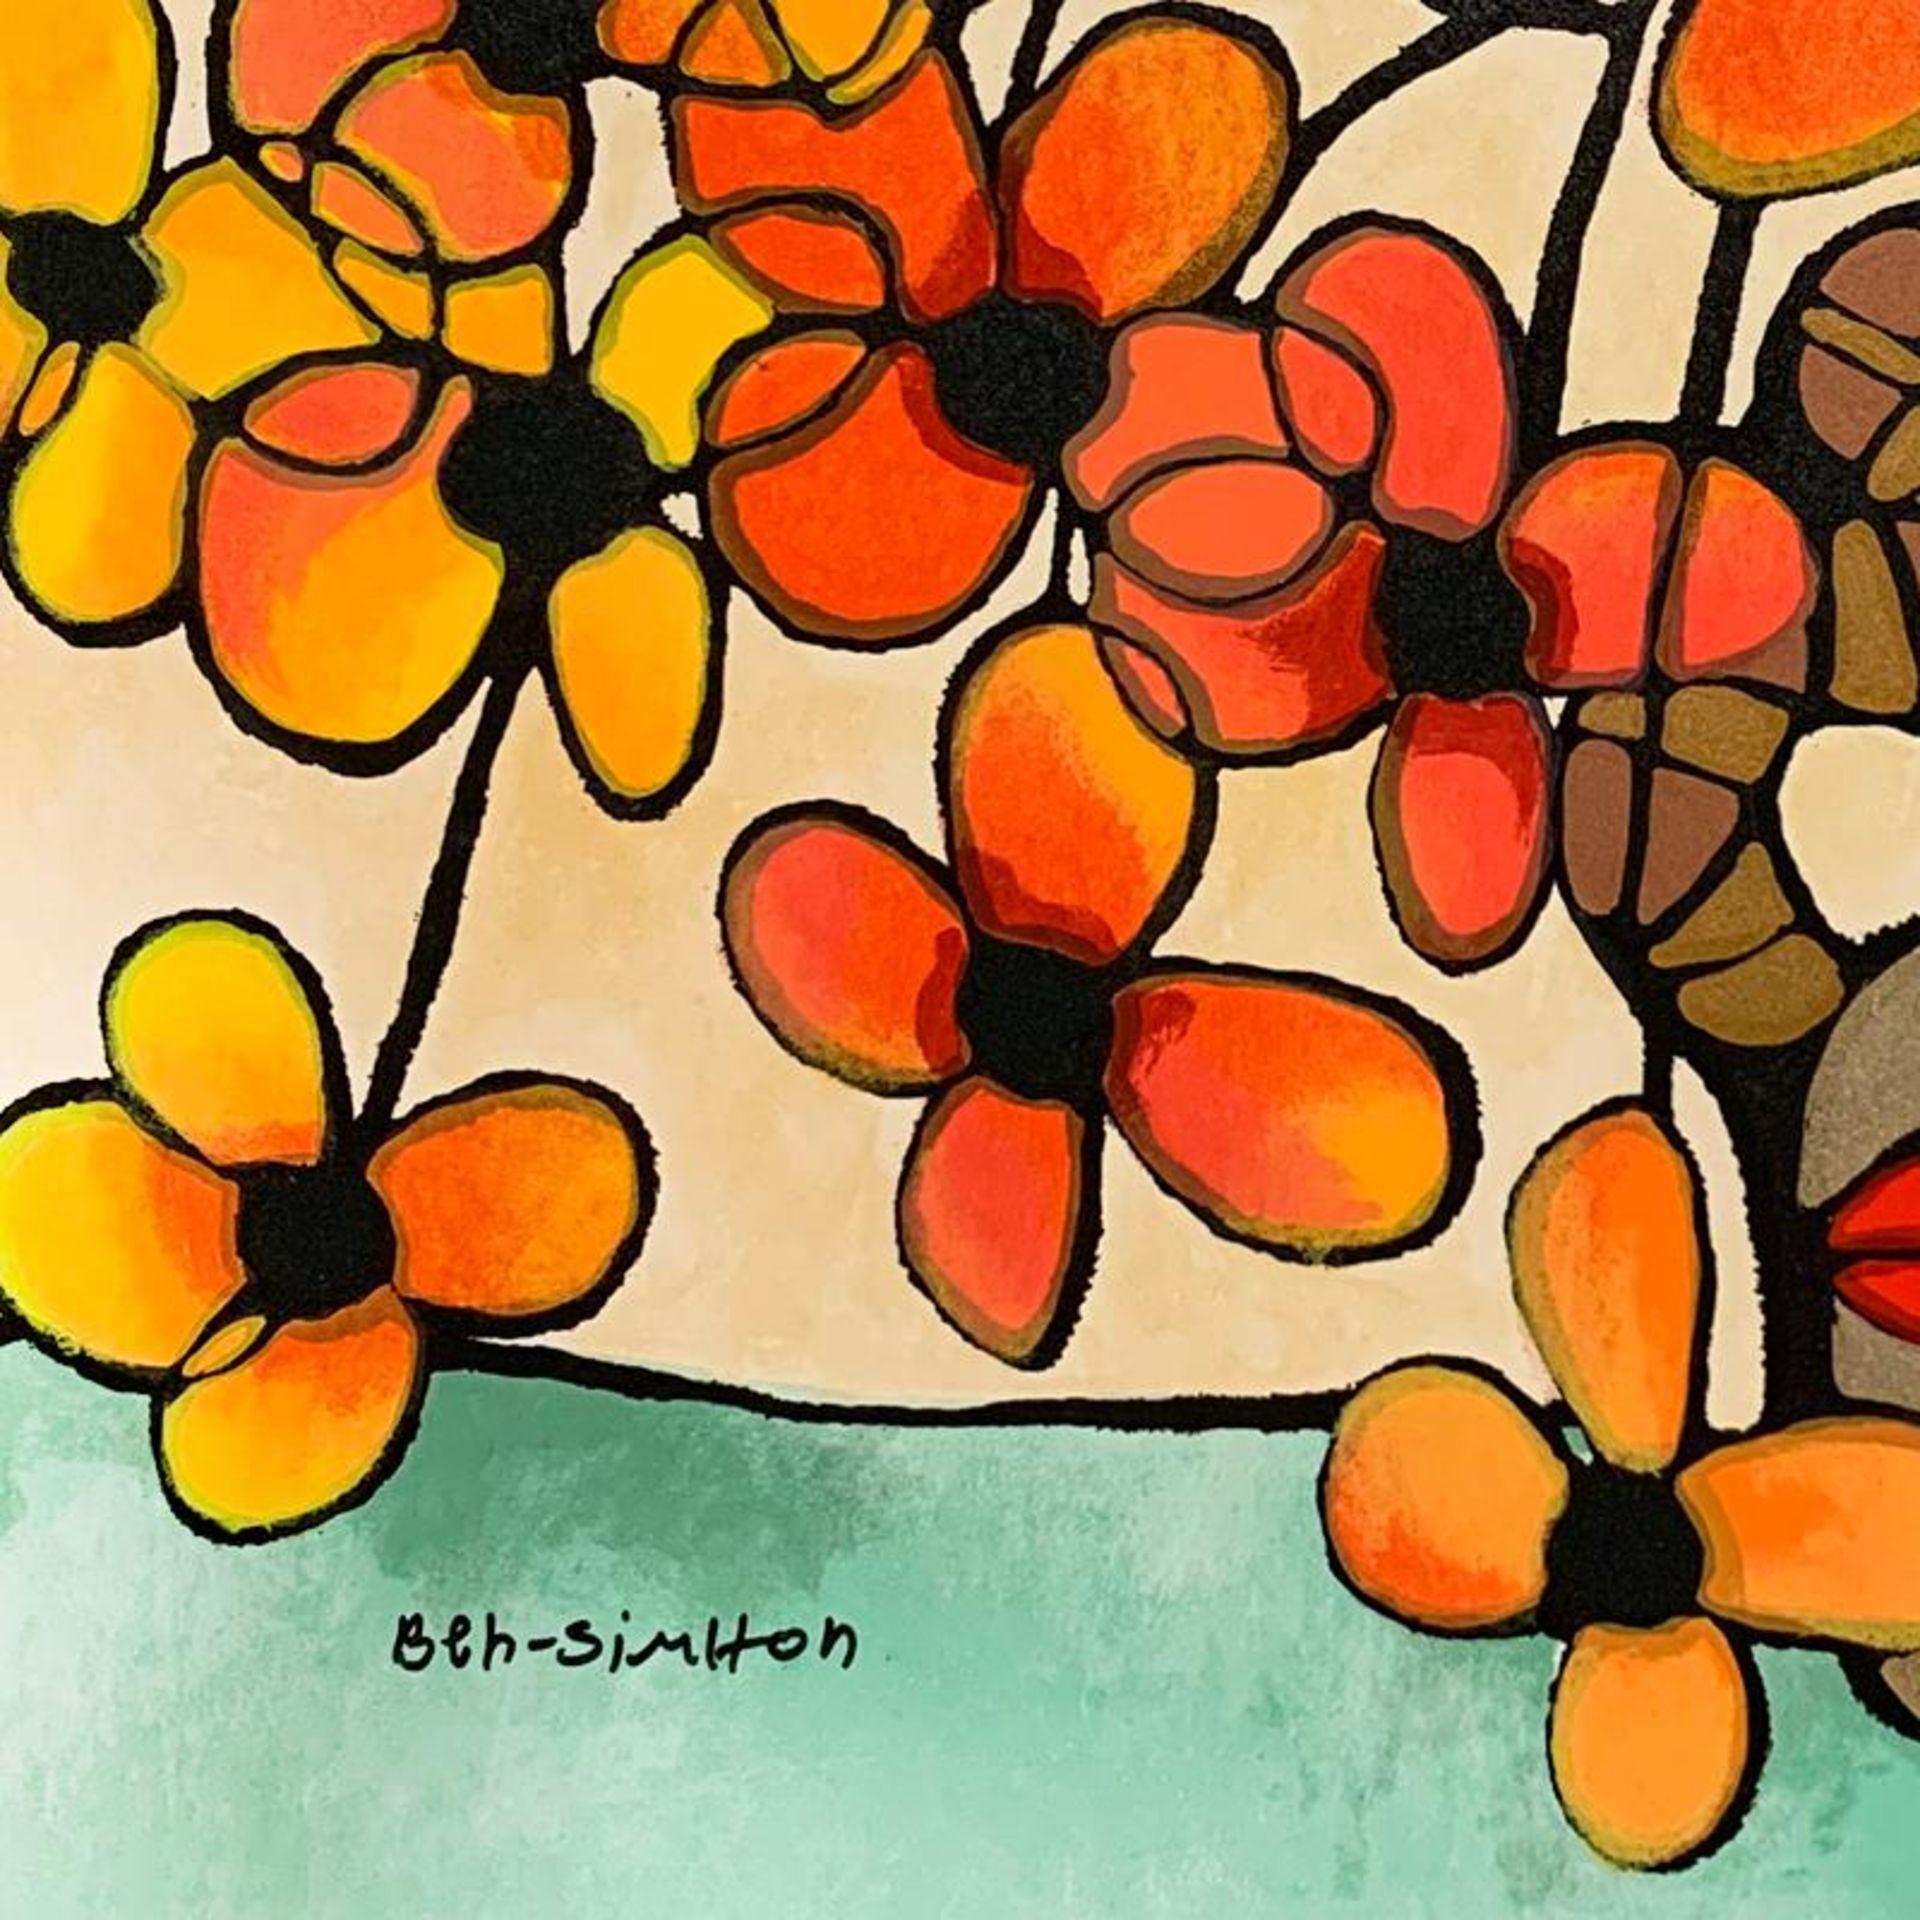 Autumn by Ben-Simhon, Avi - Image 2 of 2